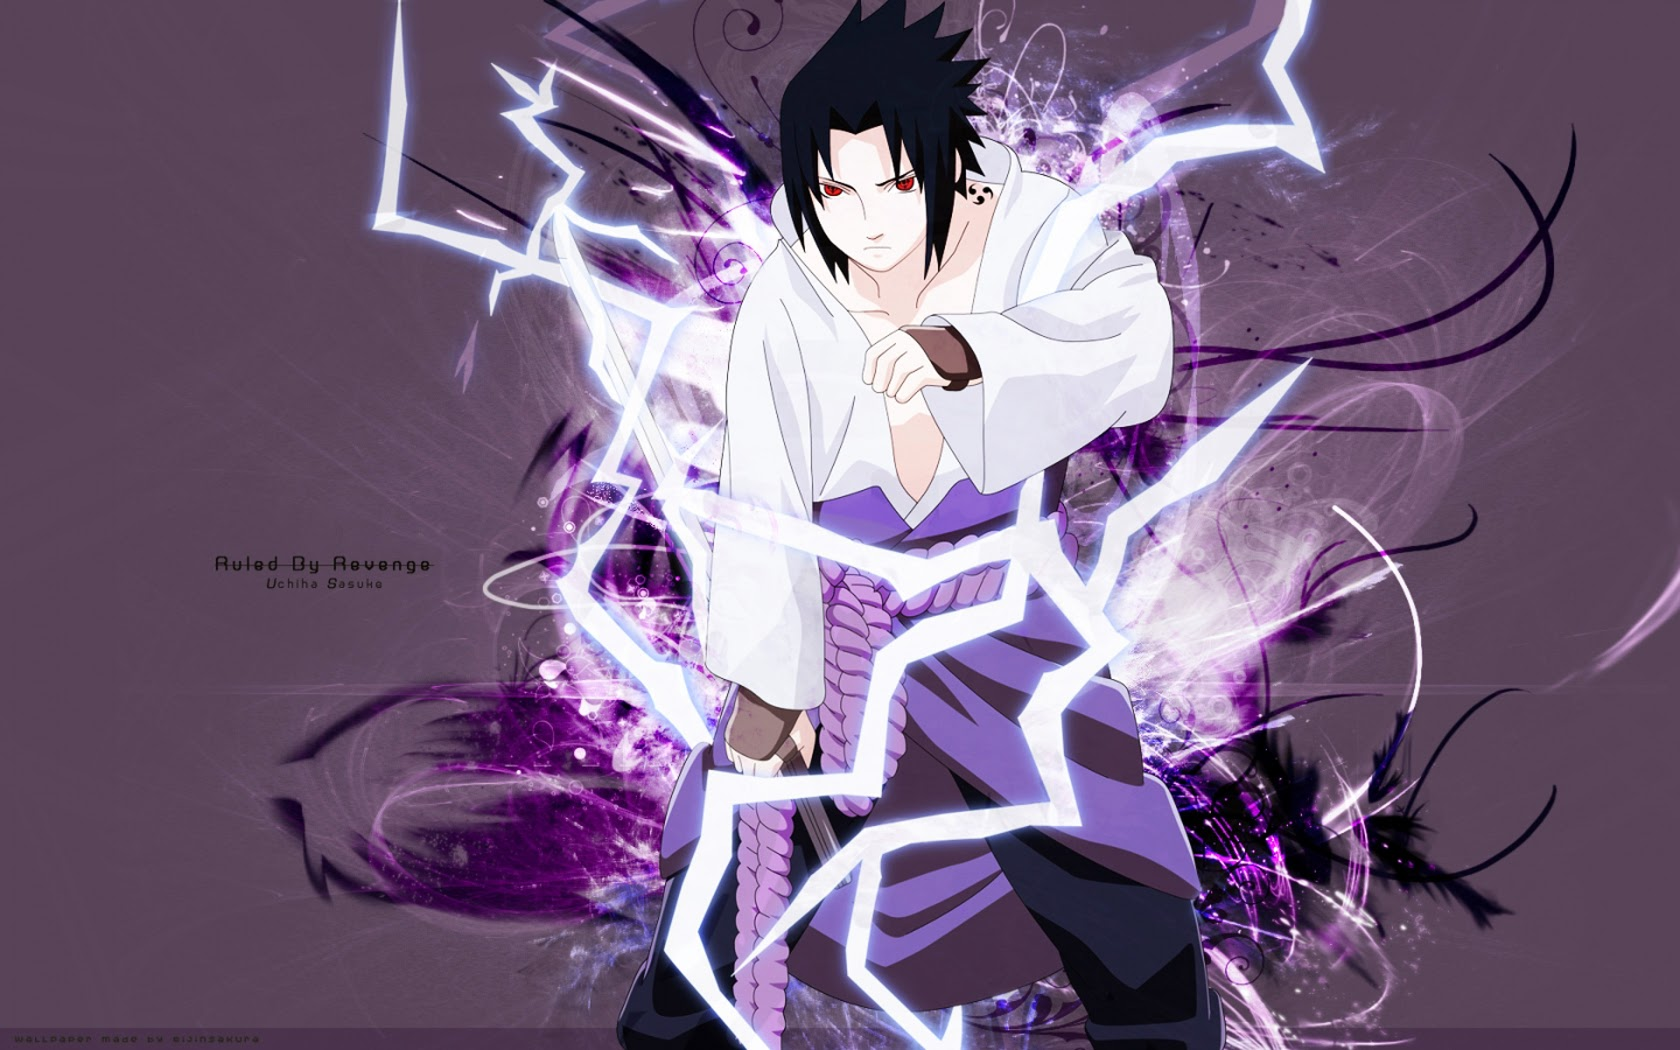 Sasuke Uchiha Wallpaper Hd - Anime In Naruto Shippuden - HD Wallpaper